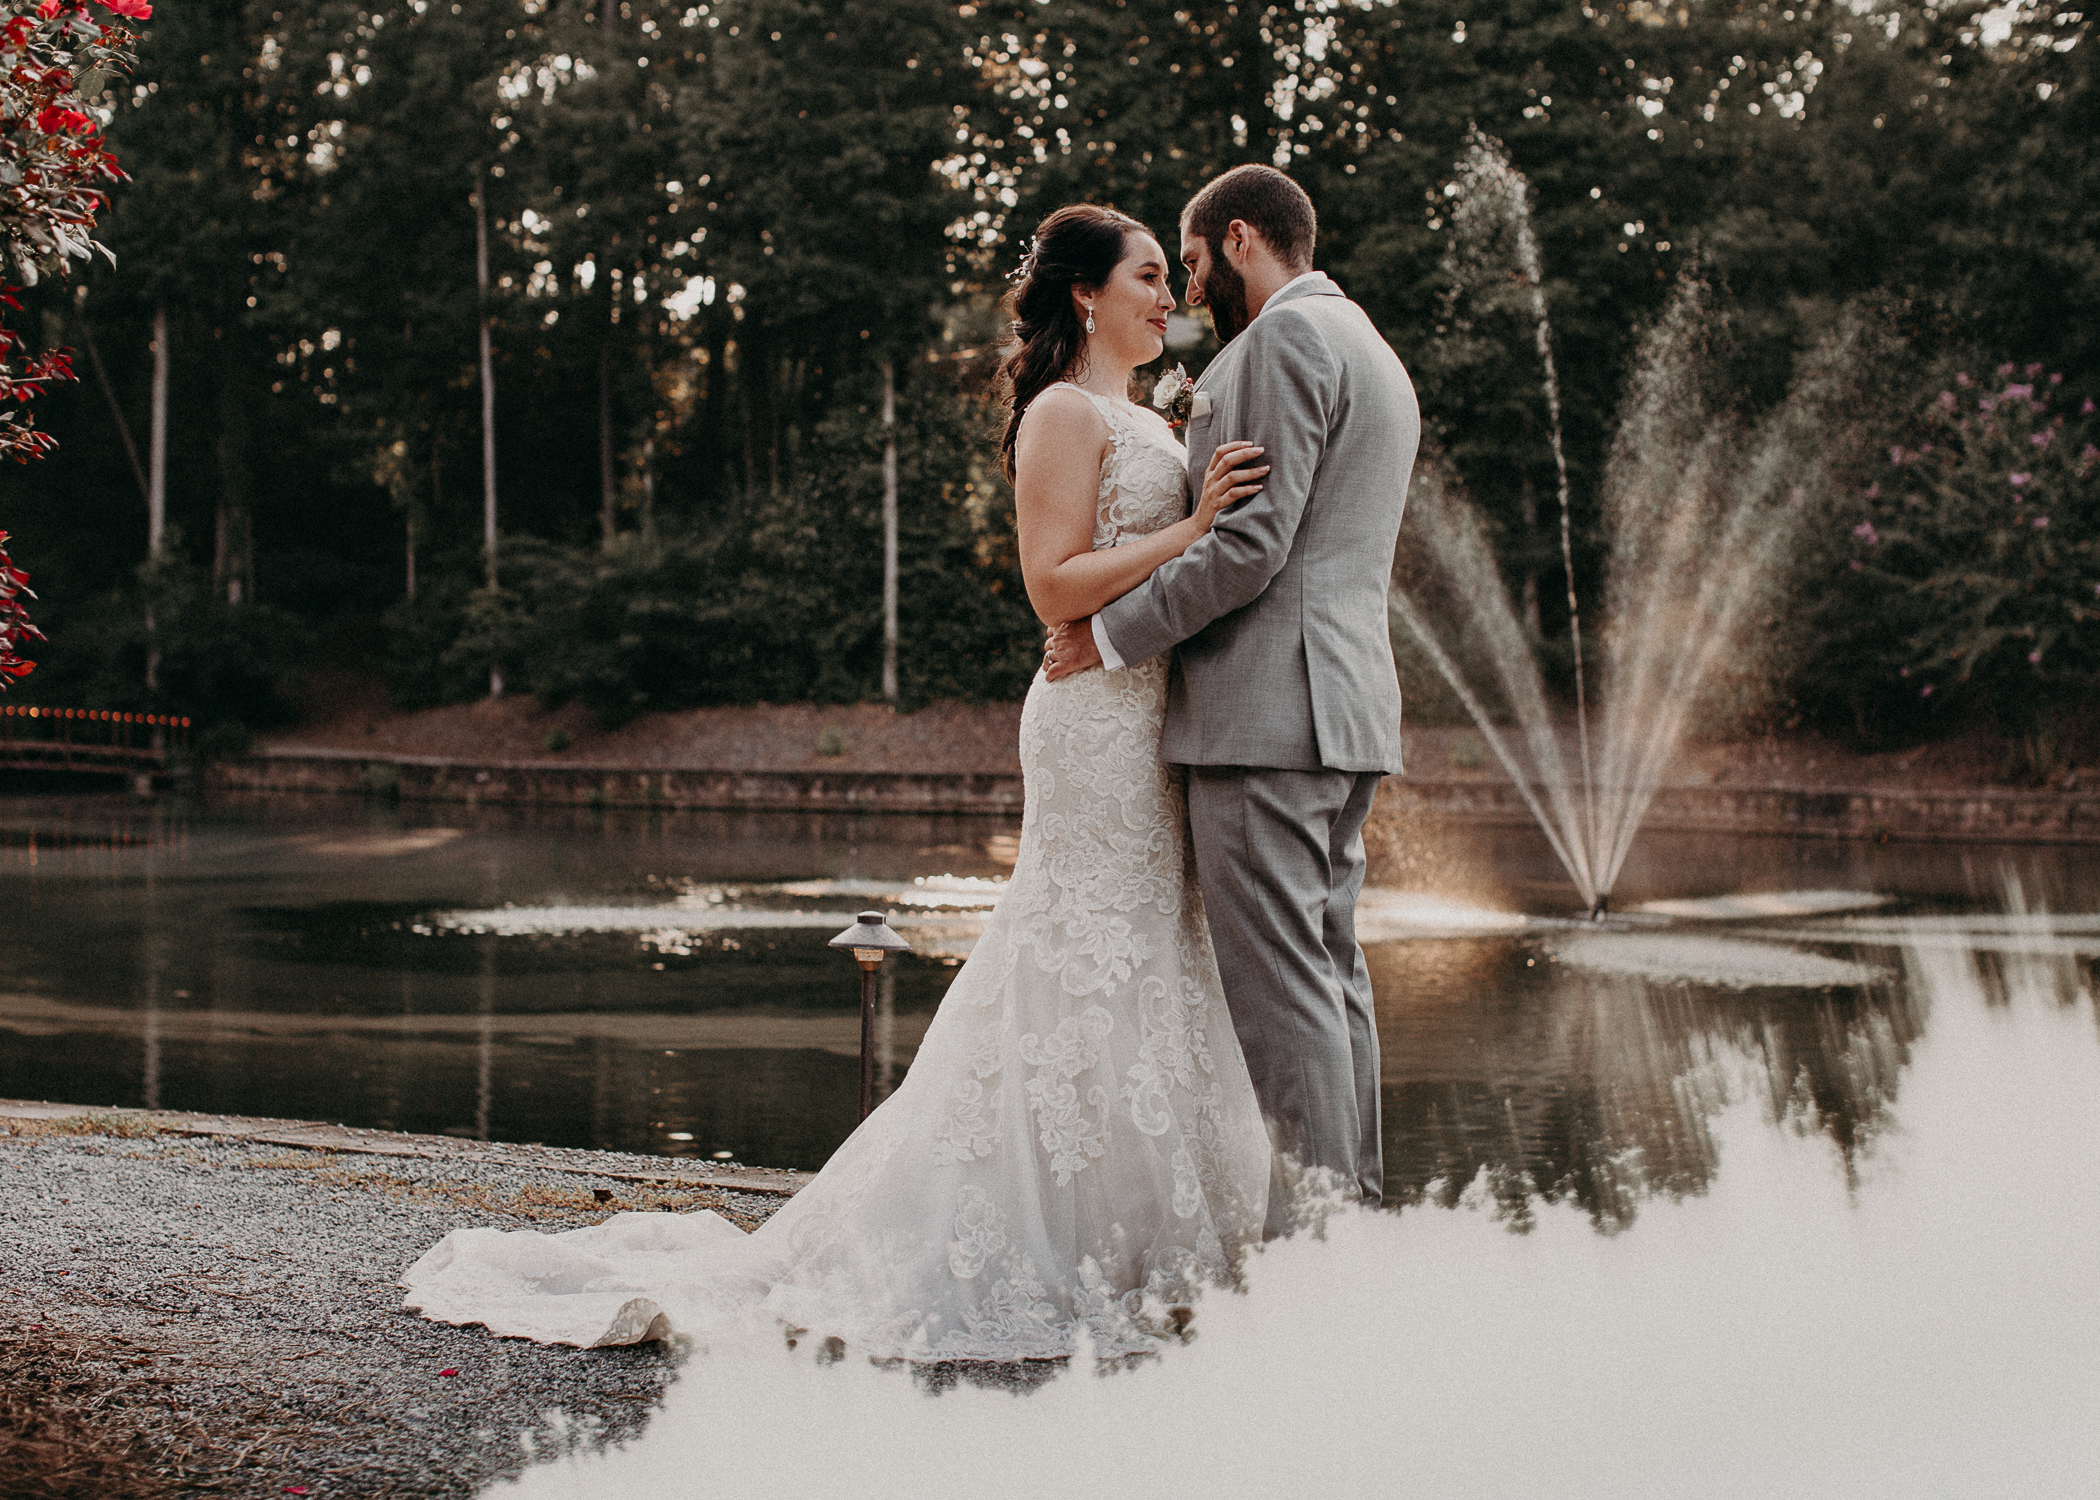 74  wedding day portraits bride and groom atlanta - georgia - ga wedding details - photographer .jpg